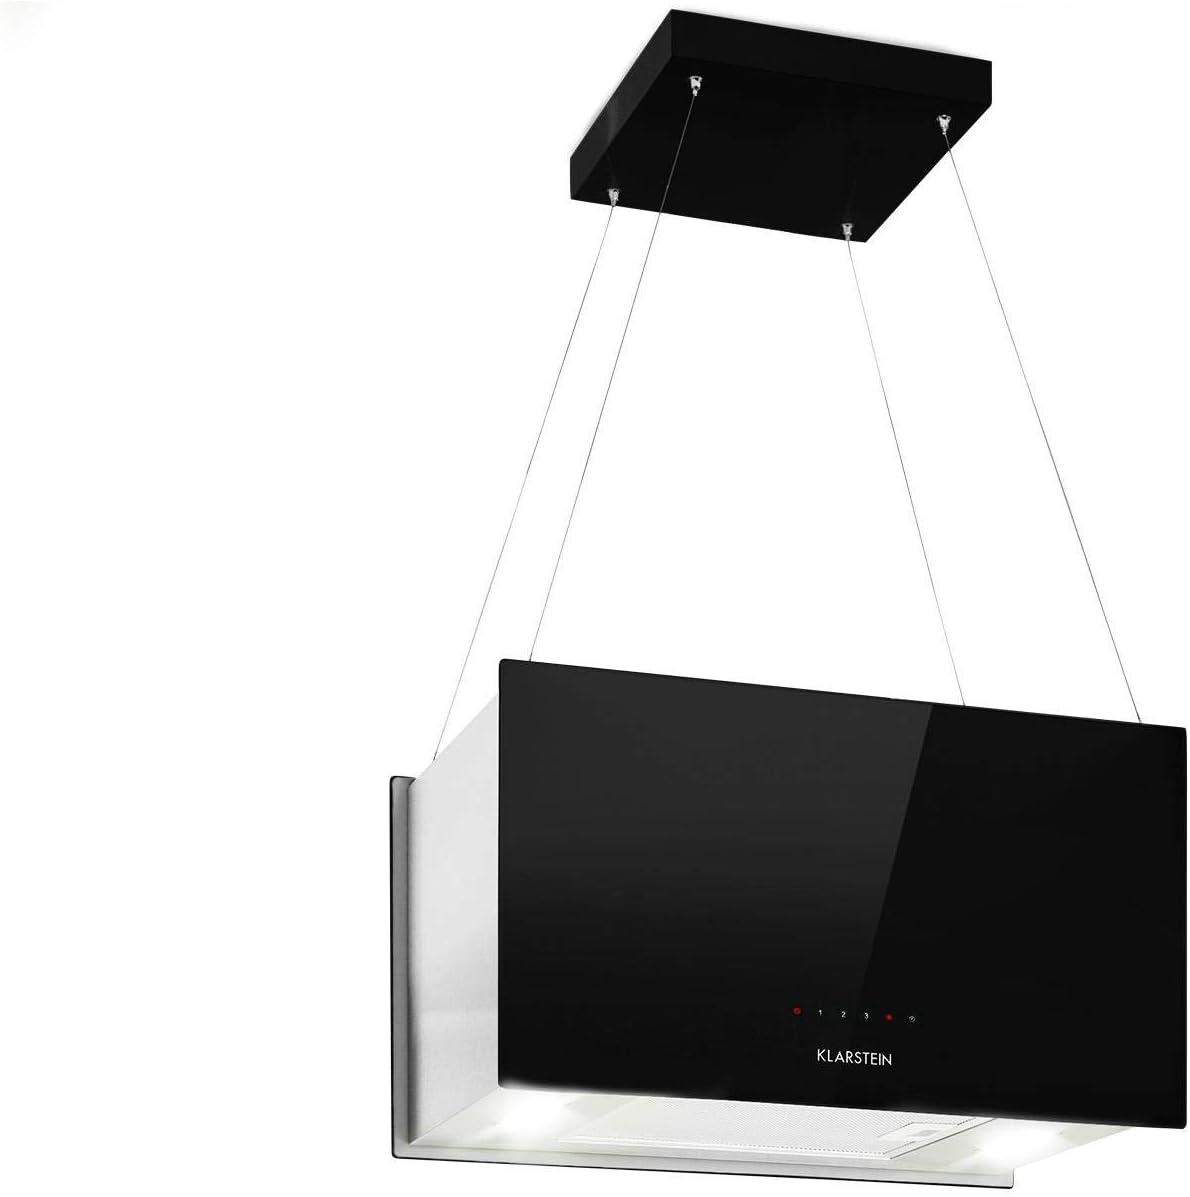 Klarstein Kronleuchter L - Campana extractora 60 cm, Extractor tipo isla, Campana de techo, Caudal de aire hasta 590 m³/h, 3 niveles, LED, Cristal espejado, Clase energética A, Negro